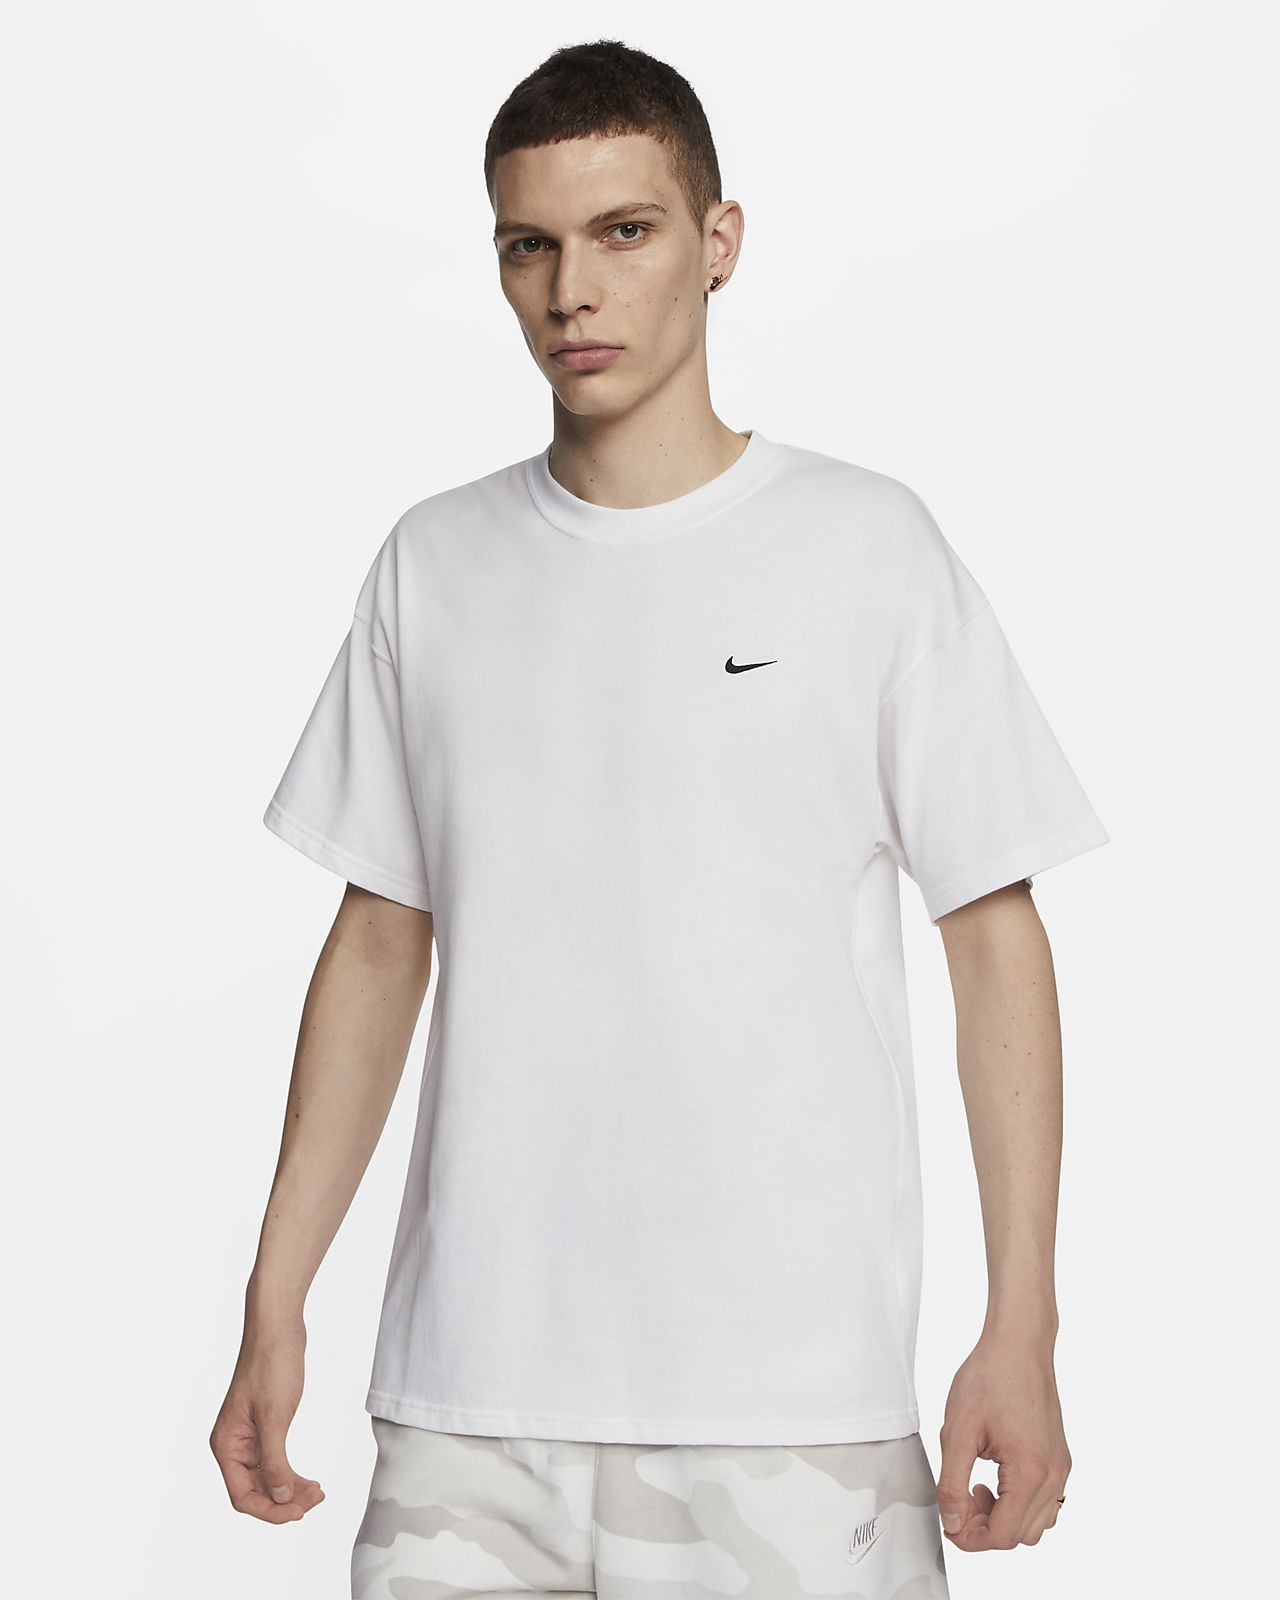 NikeLab Kurzarm-T-Shirt